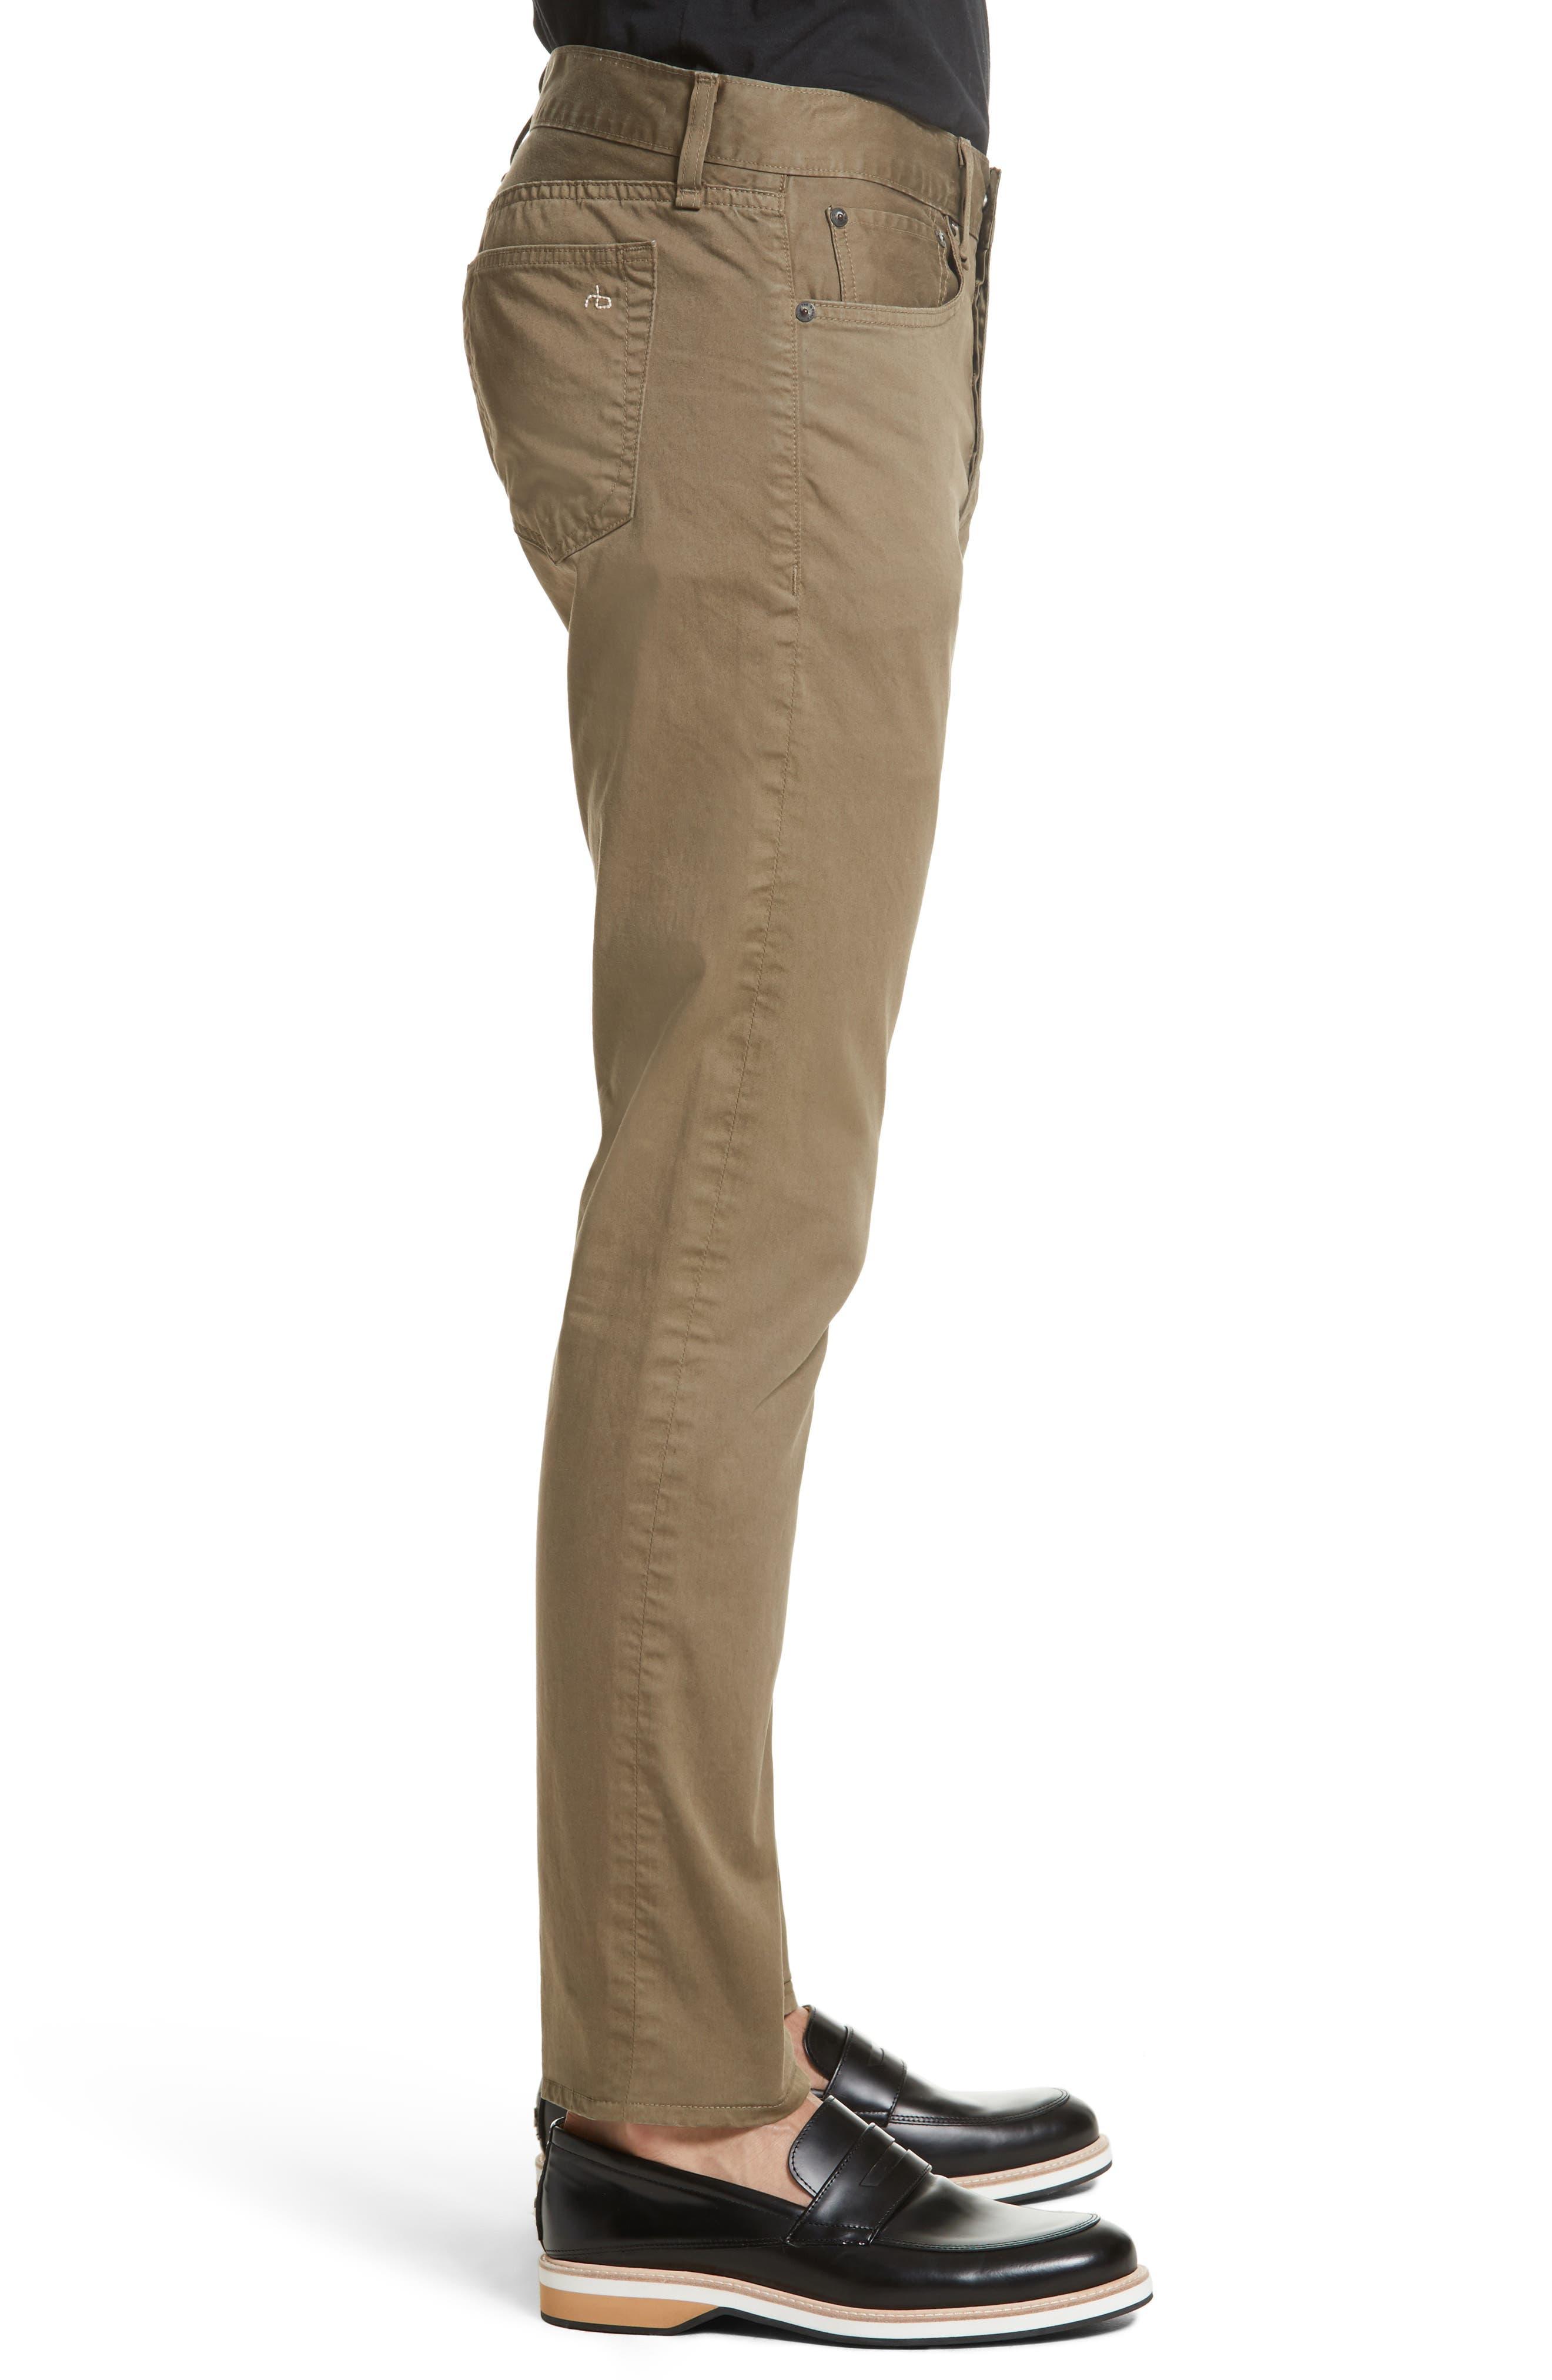 Fit 2 Five-Pocket Twill Pants,                             Alternate thumbnail 3, color,                             319